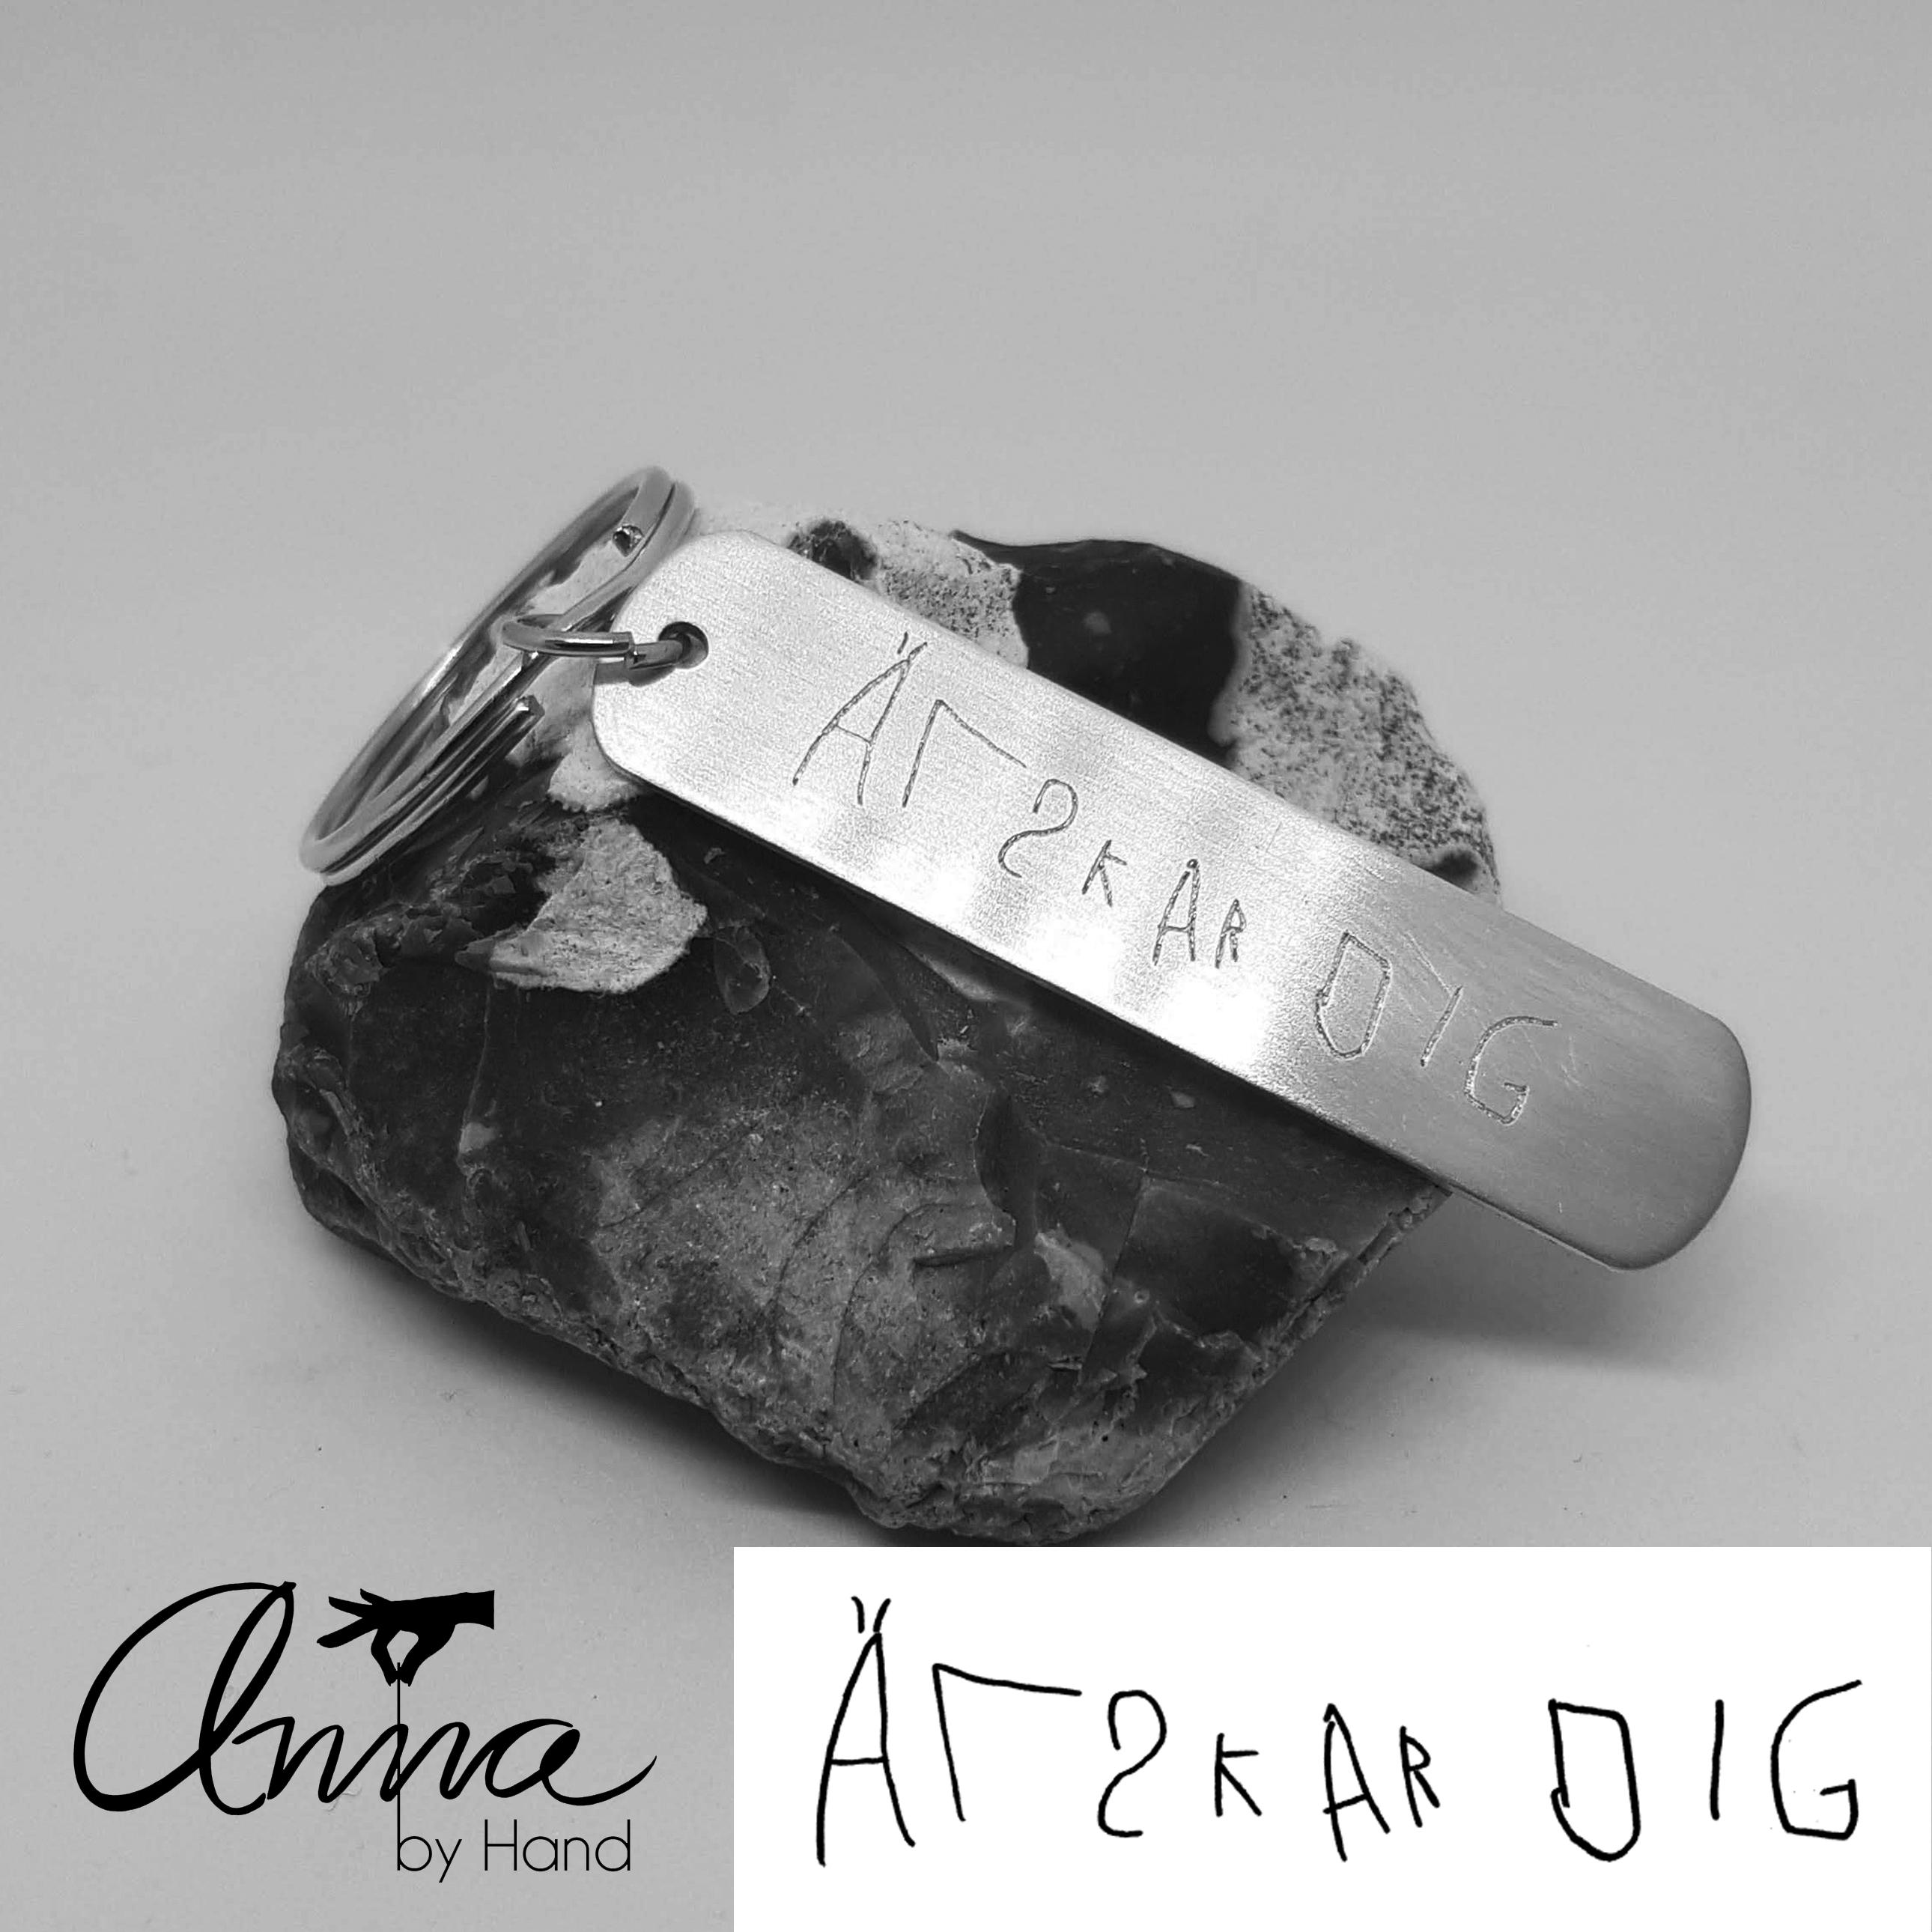 Nyckelring med personlig gravyr – Anna by Hand deccac6fbca0a